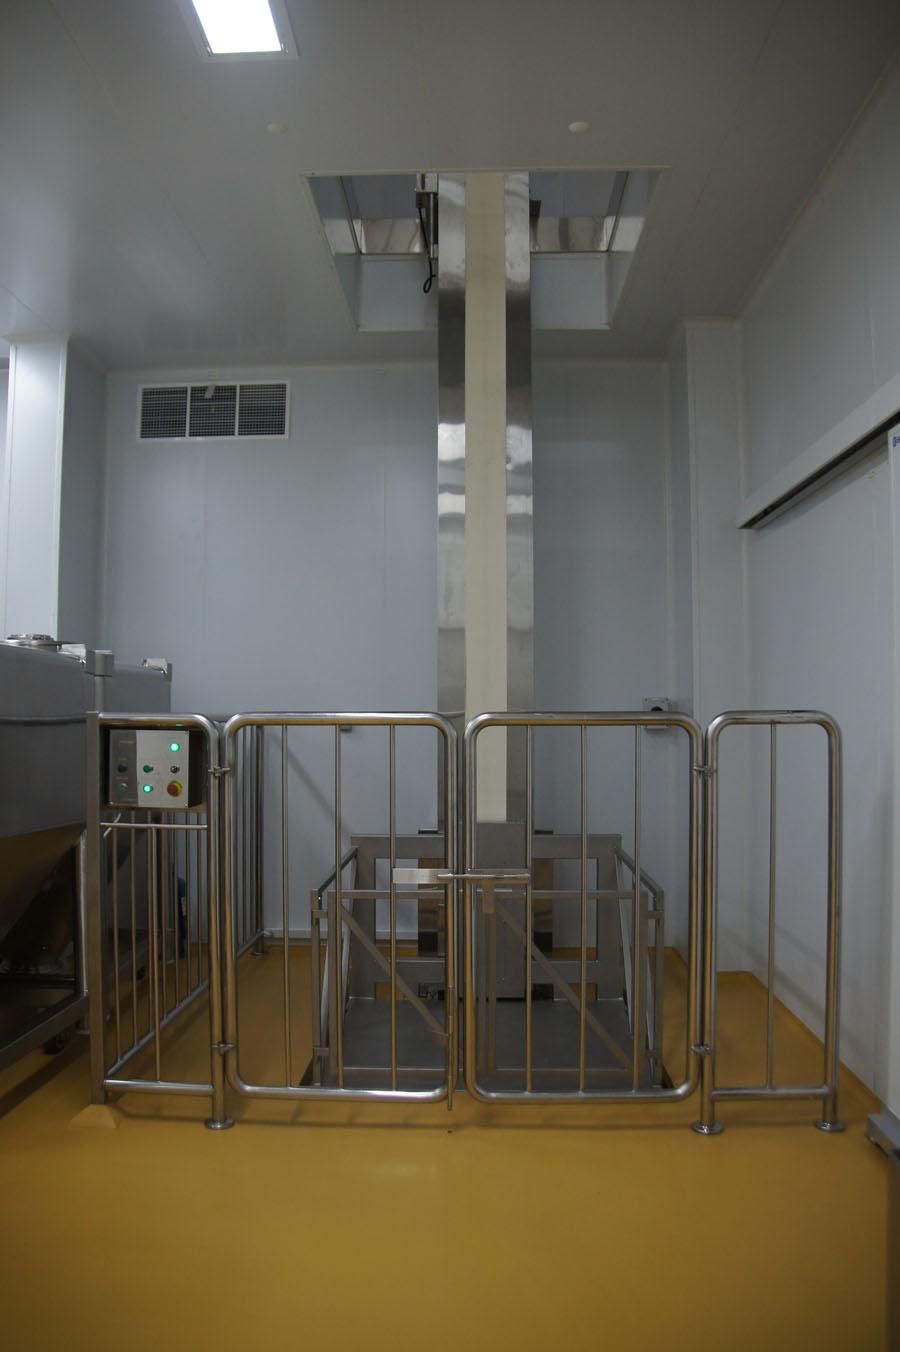 Image of Bucket elevators and lifting equipment